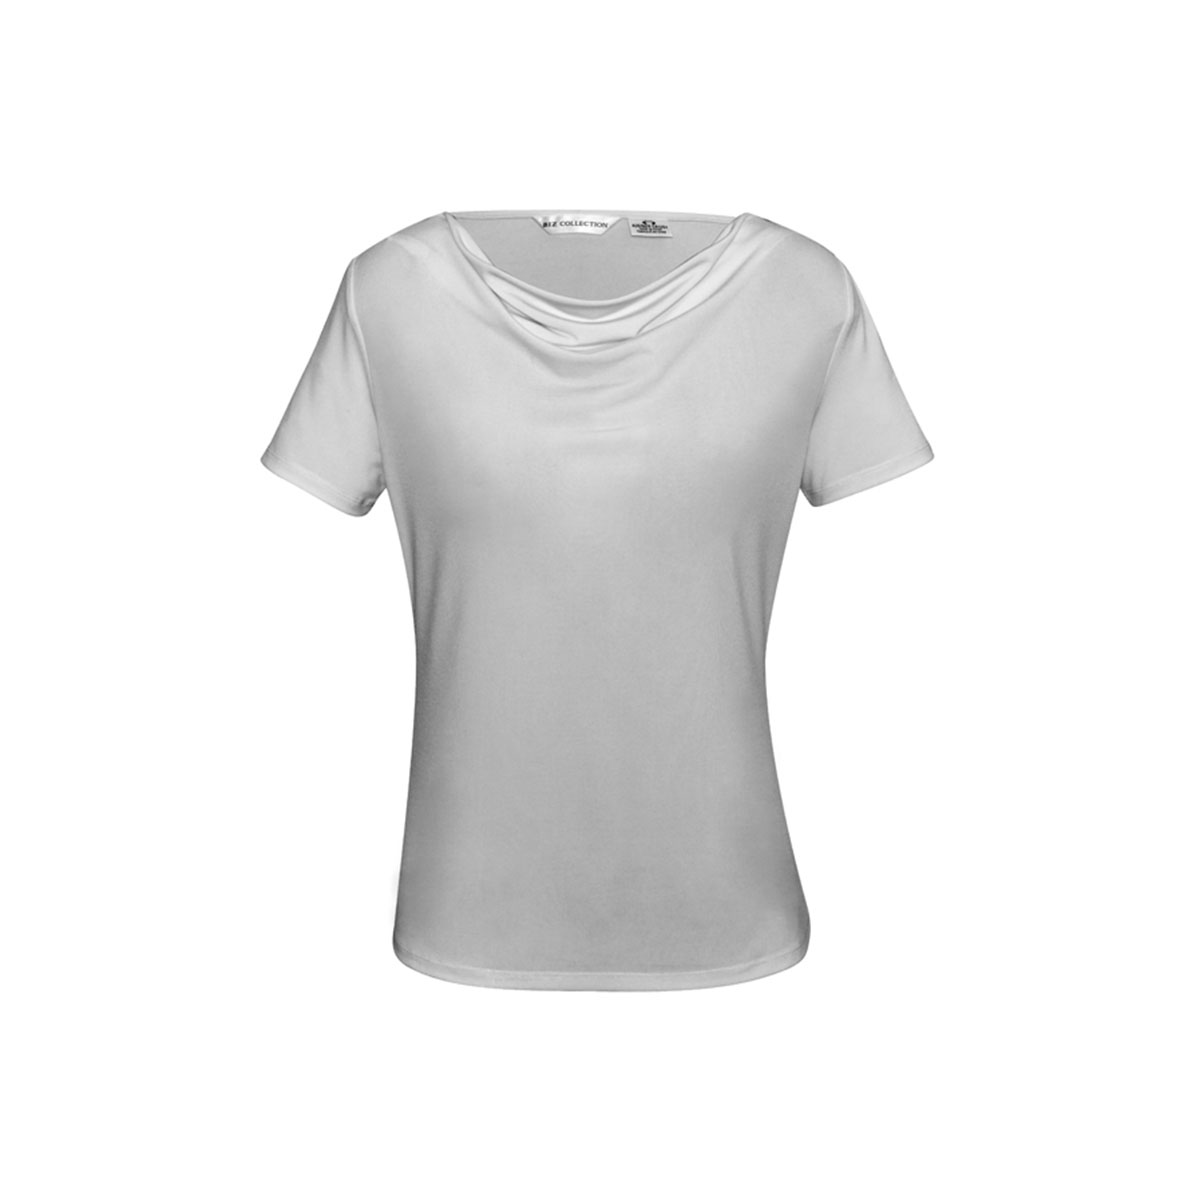 Ladies Ava Drape Knit Top-Silver Mist